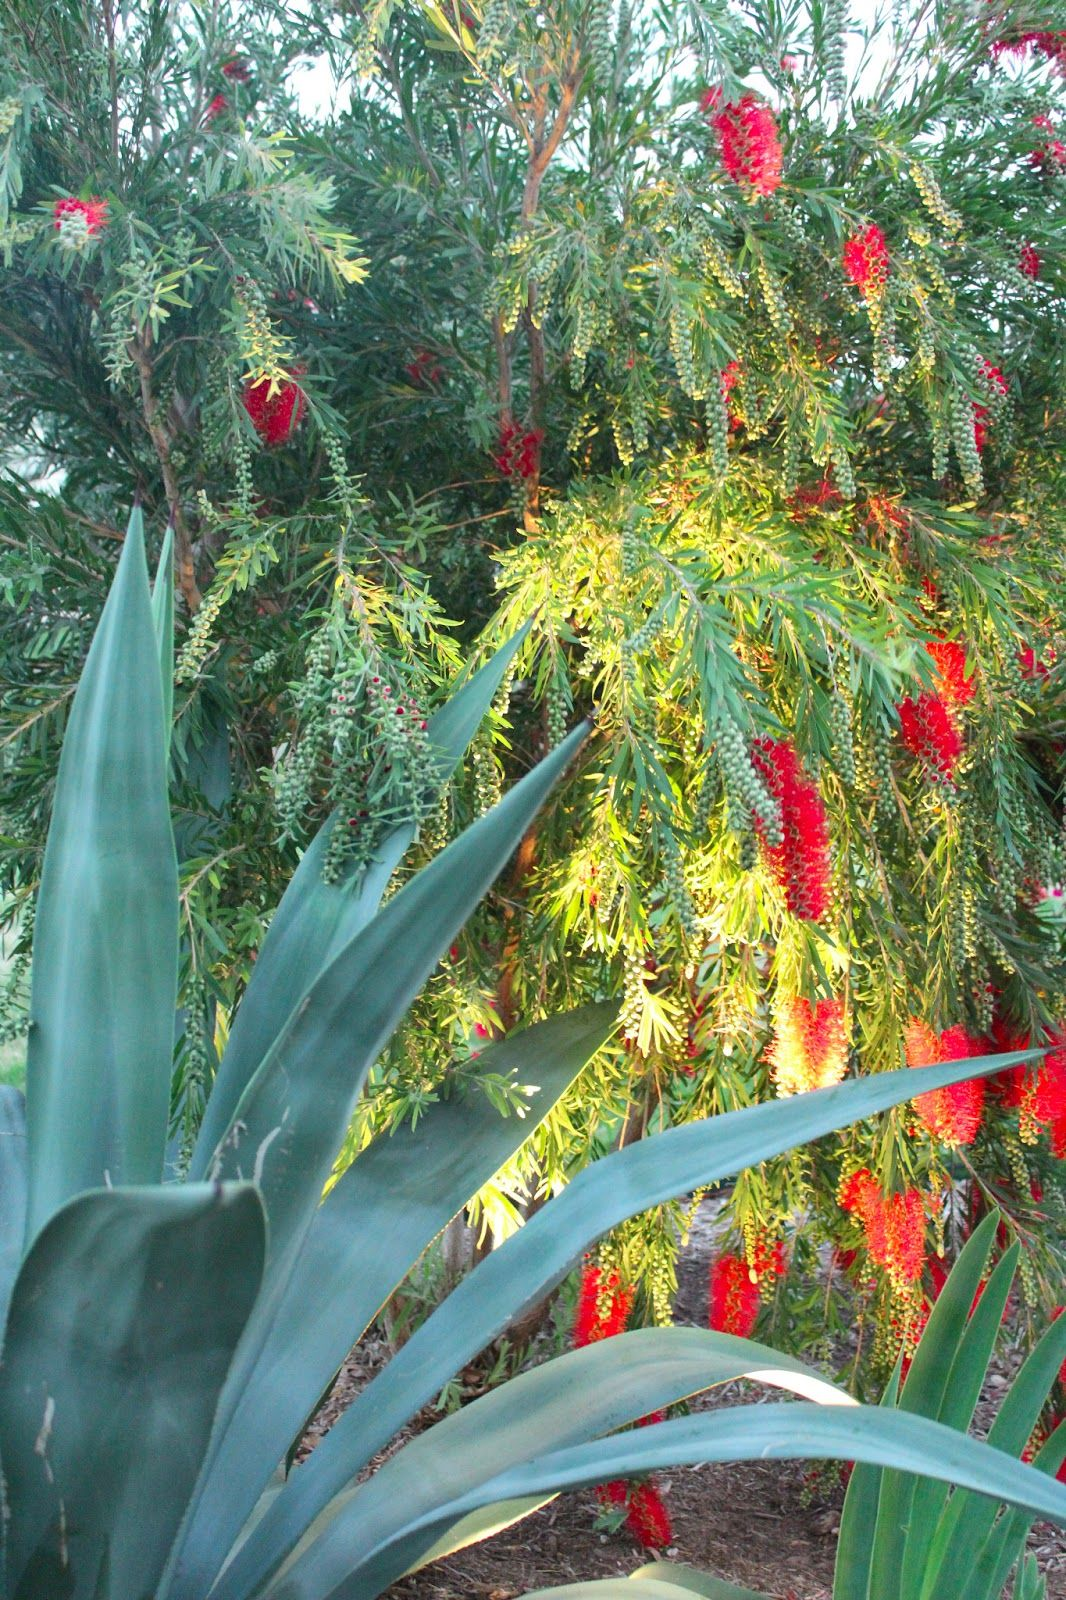 Sharing Natures Garden: Bottle brush blooms ...